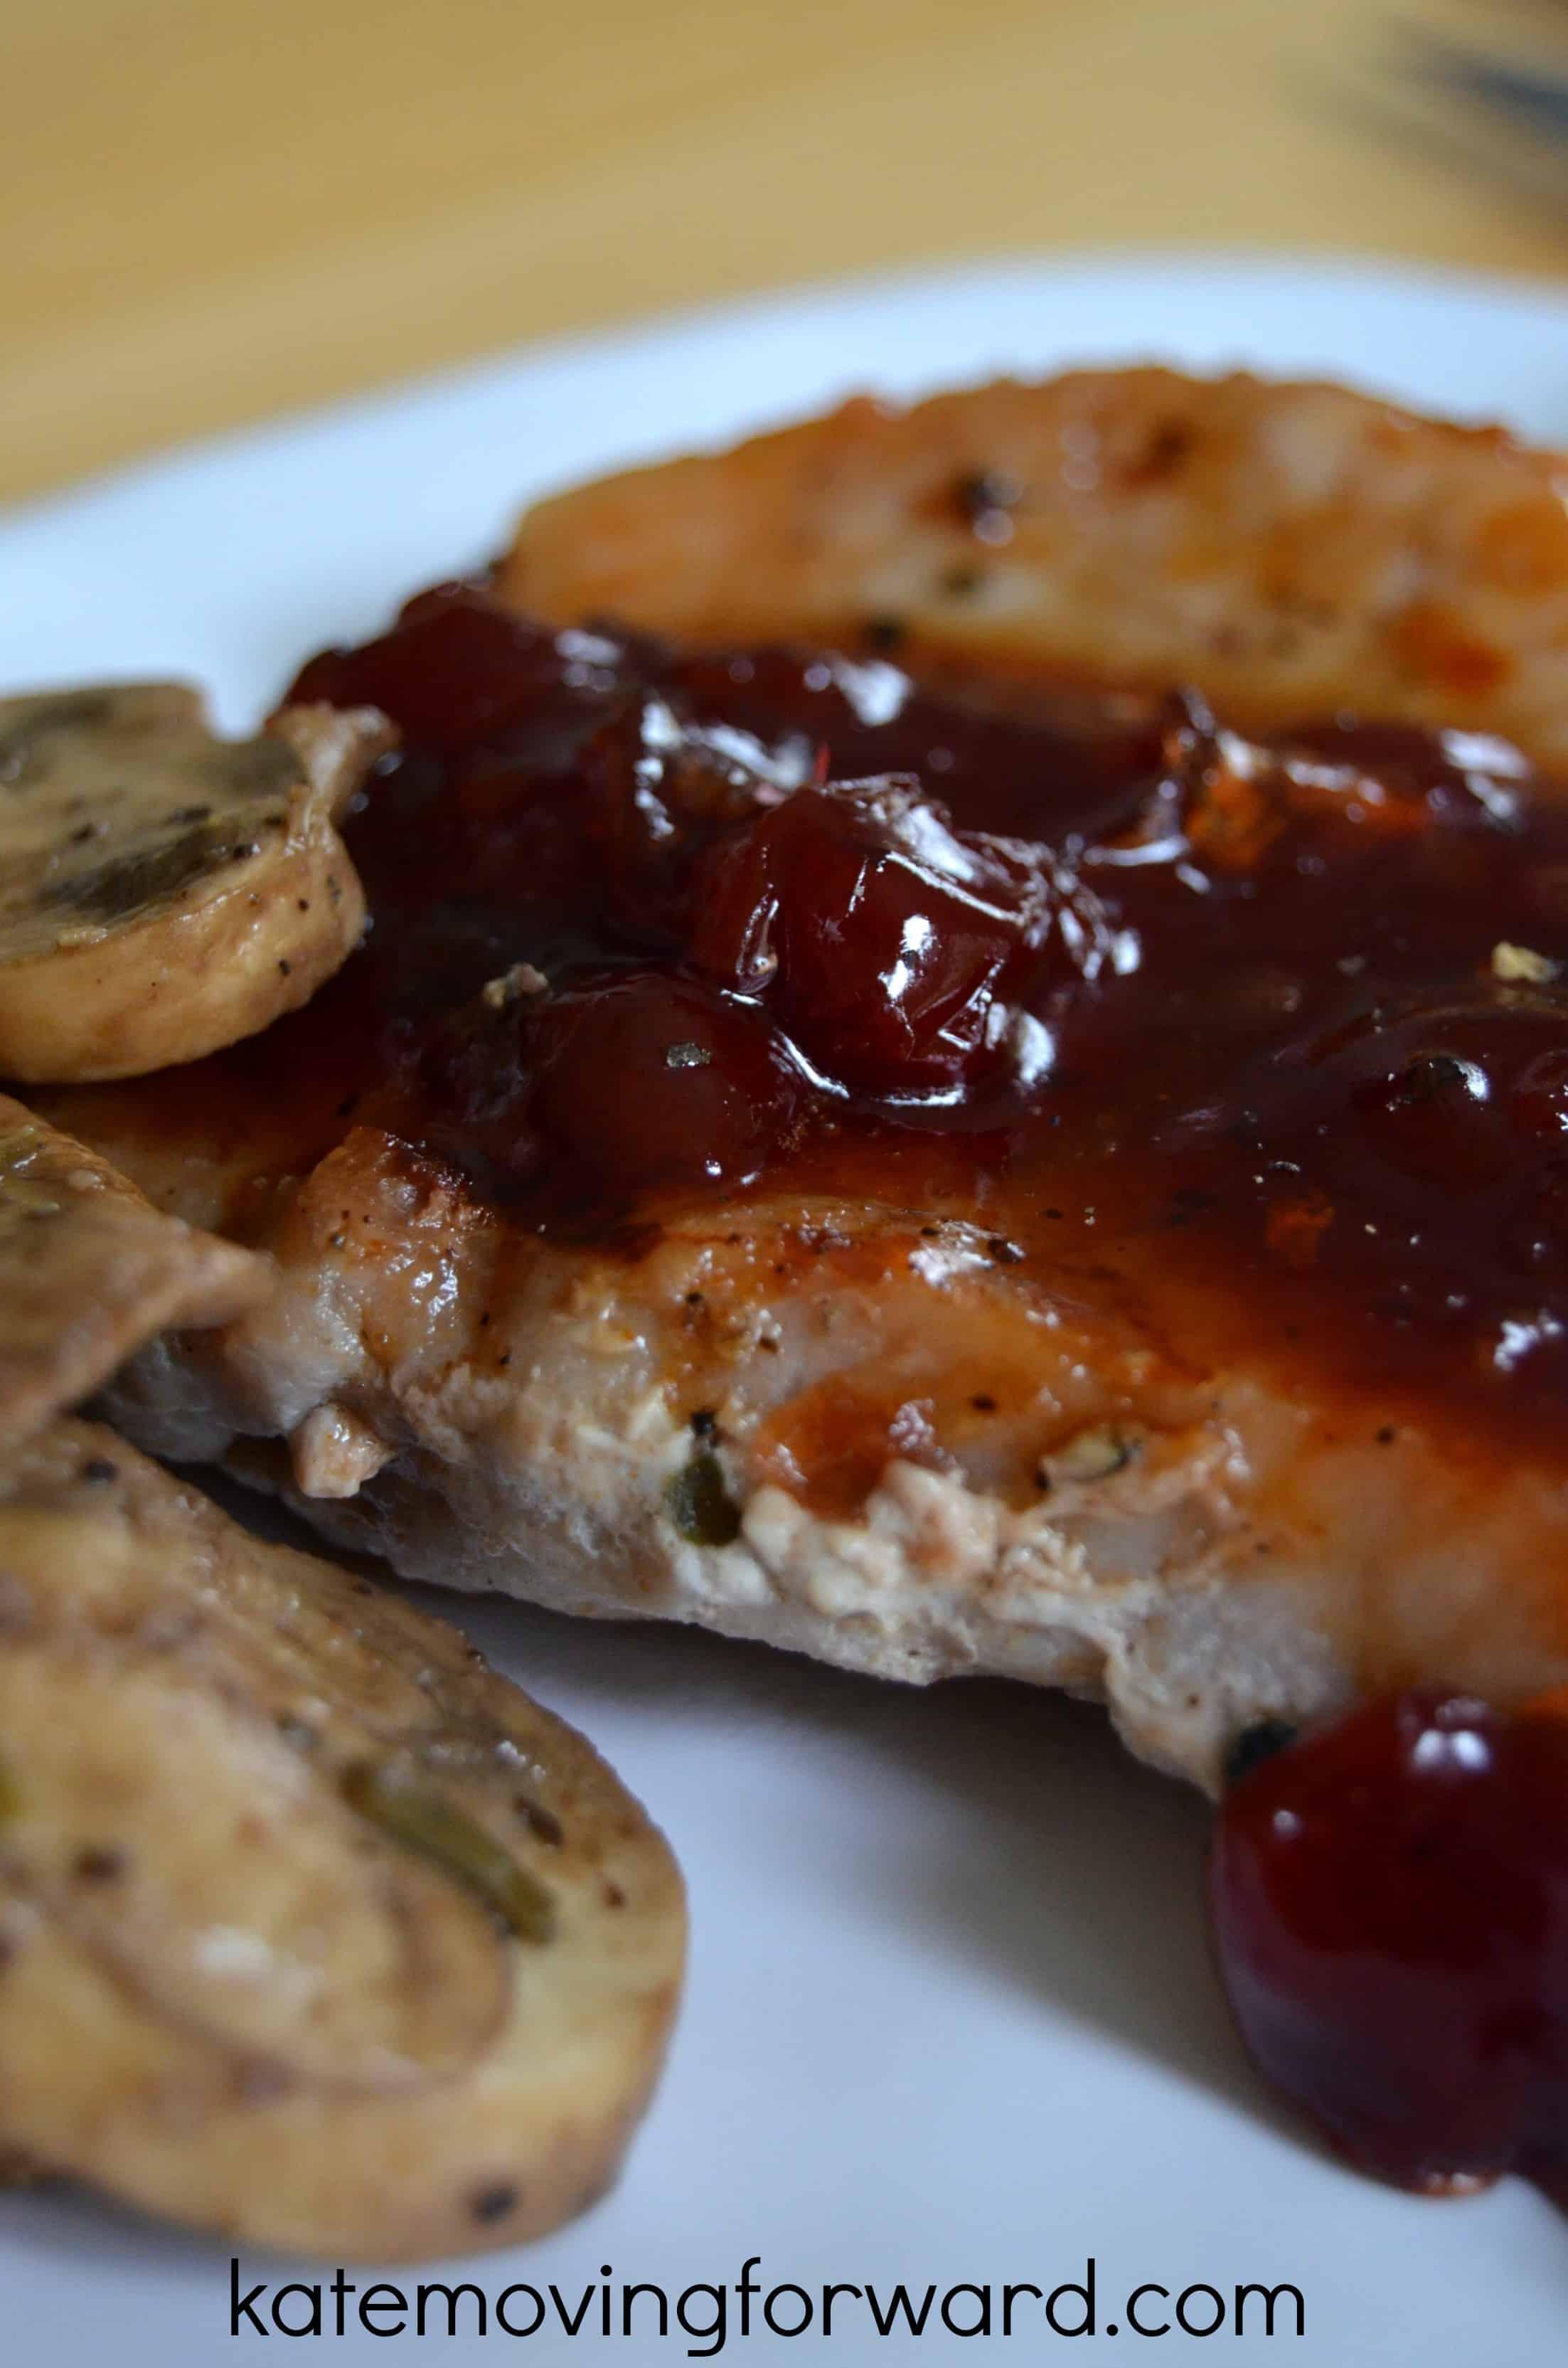 jelly covered pork chop